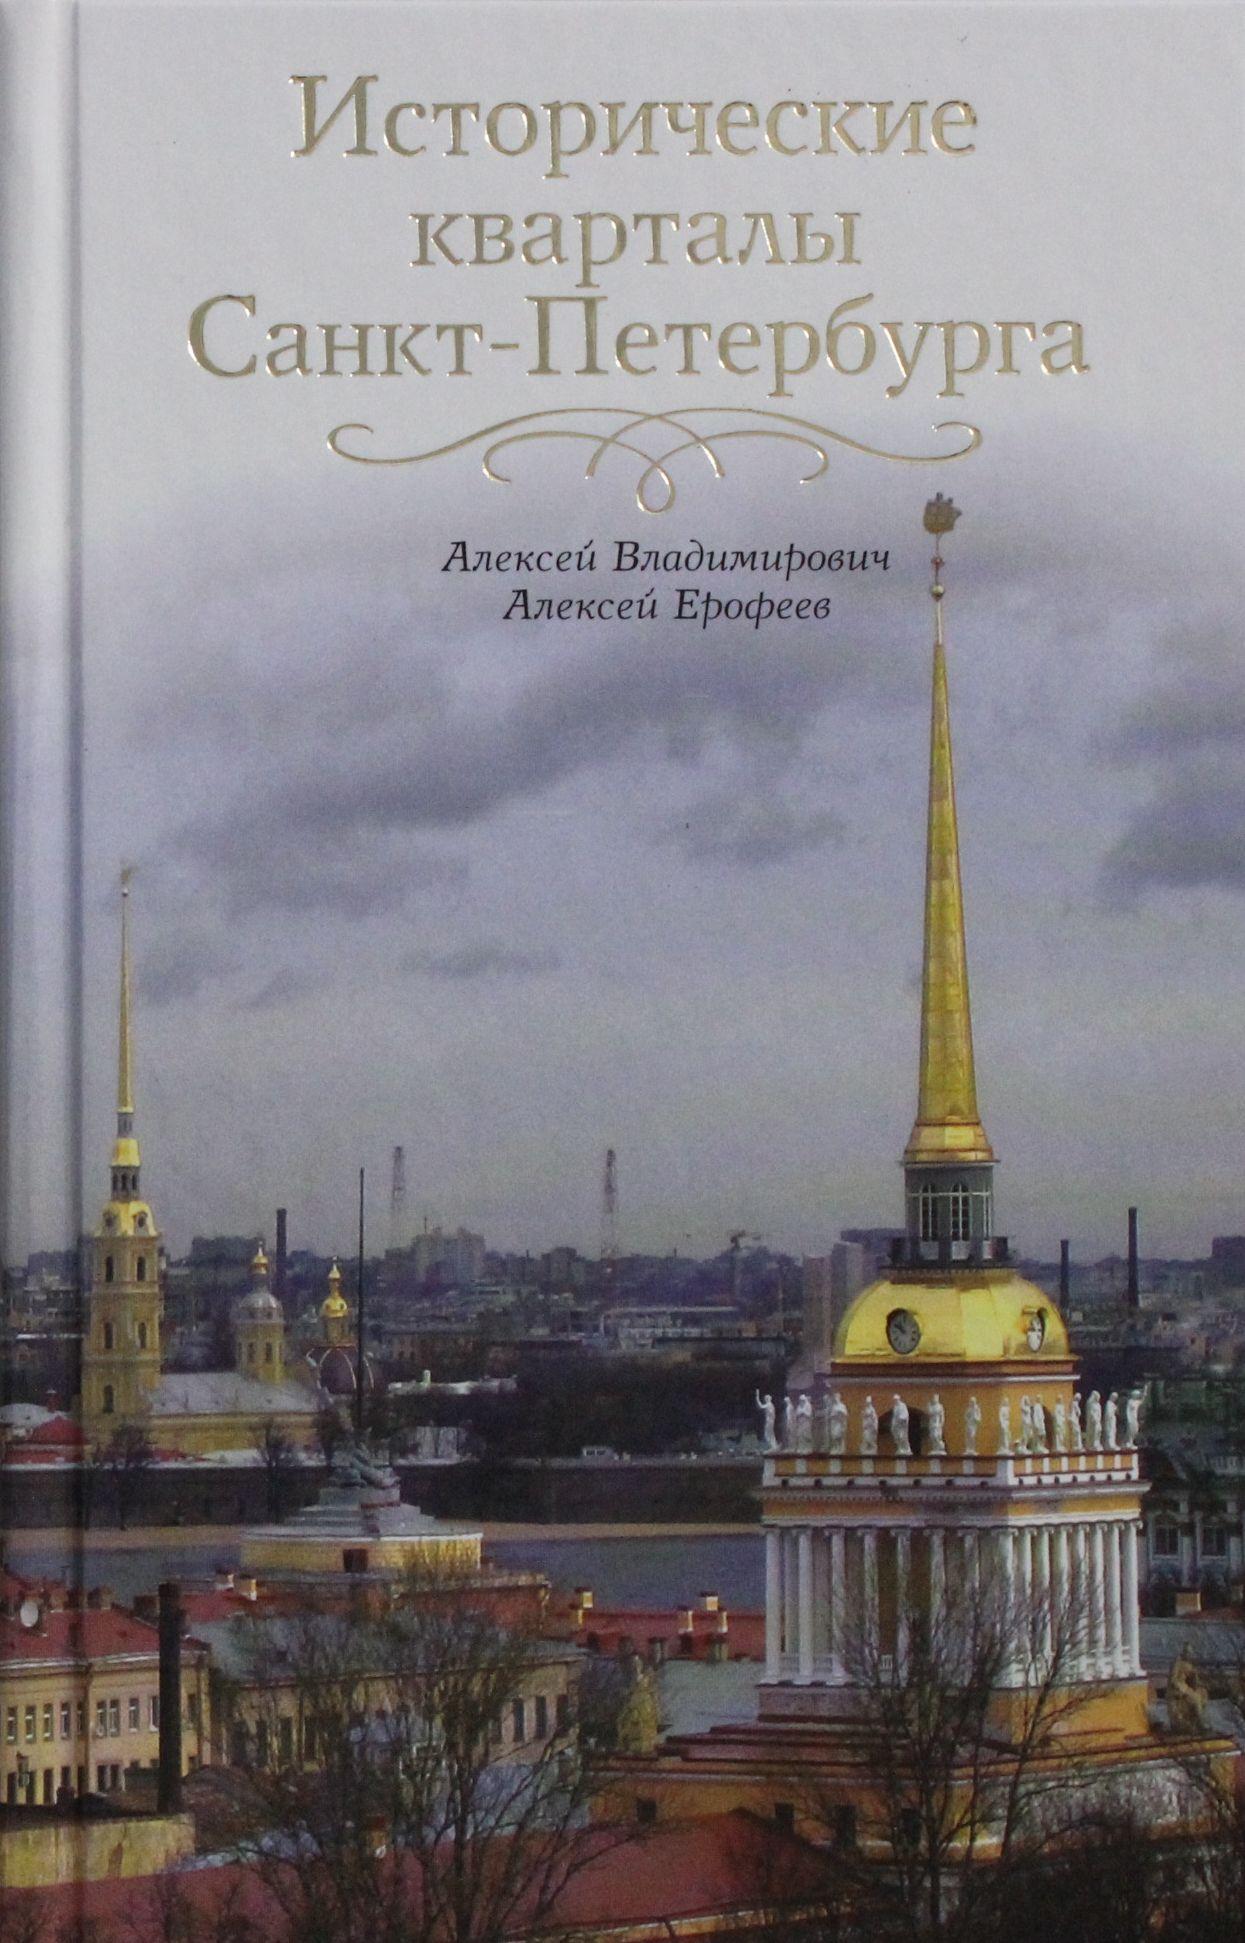 Istoricheskie kvartaly Sankt-Peterburga